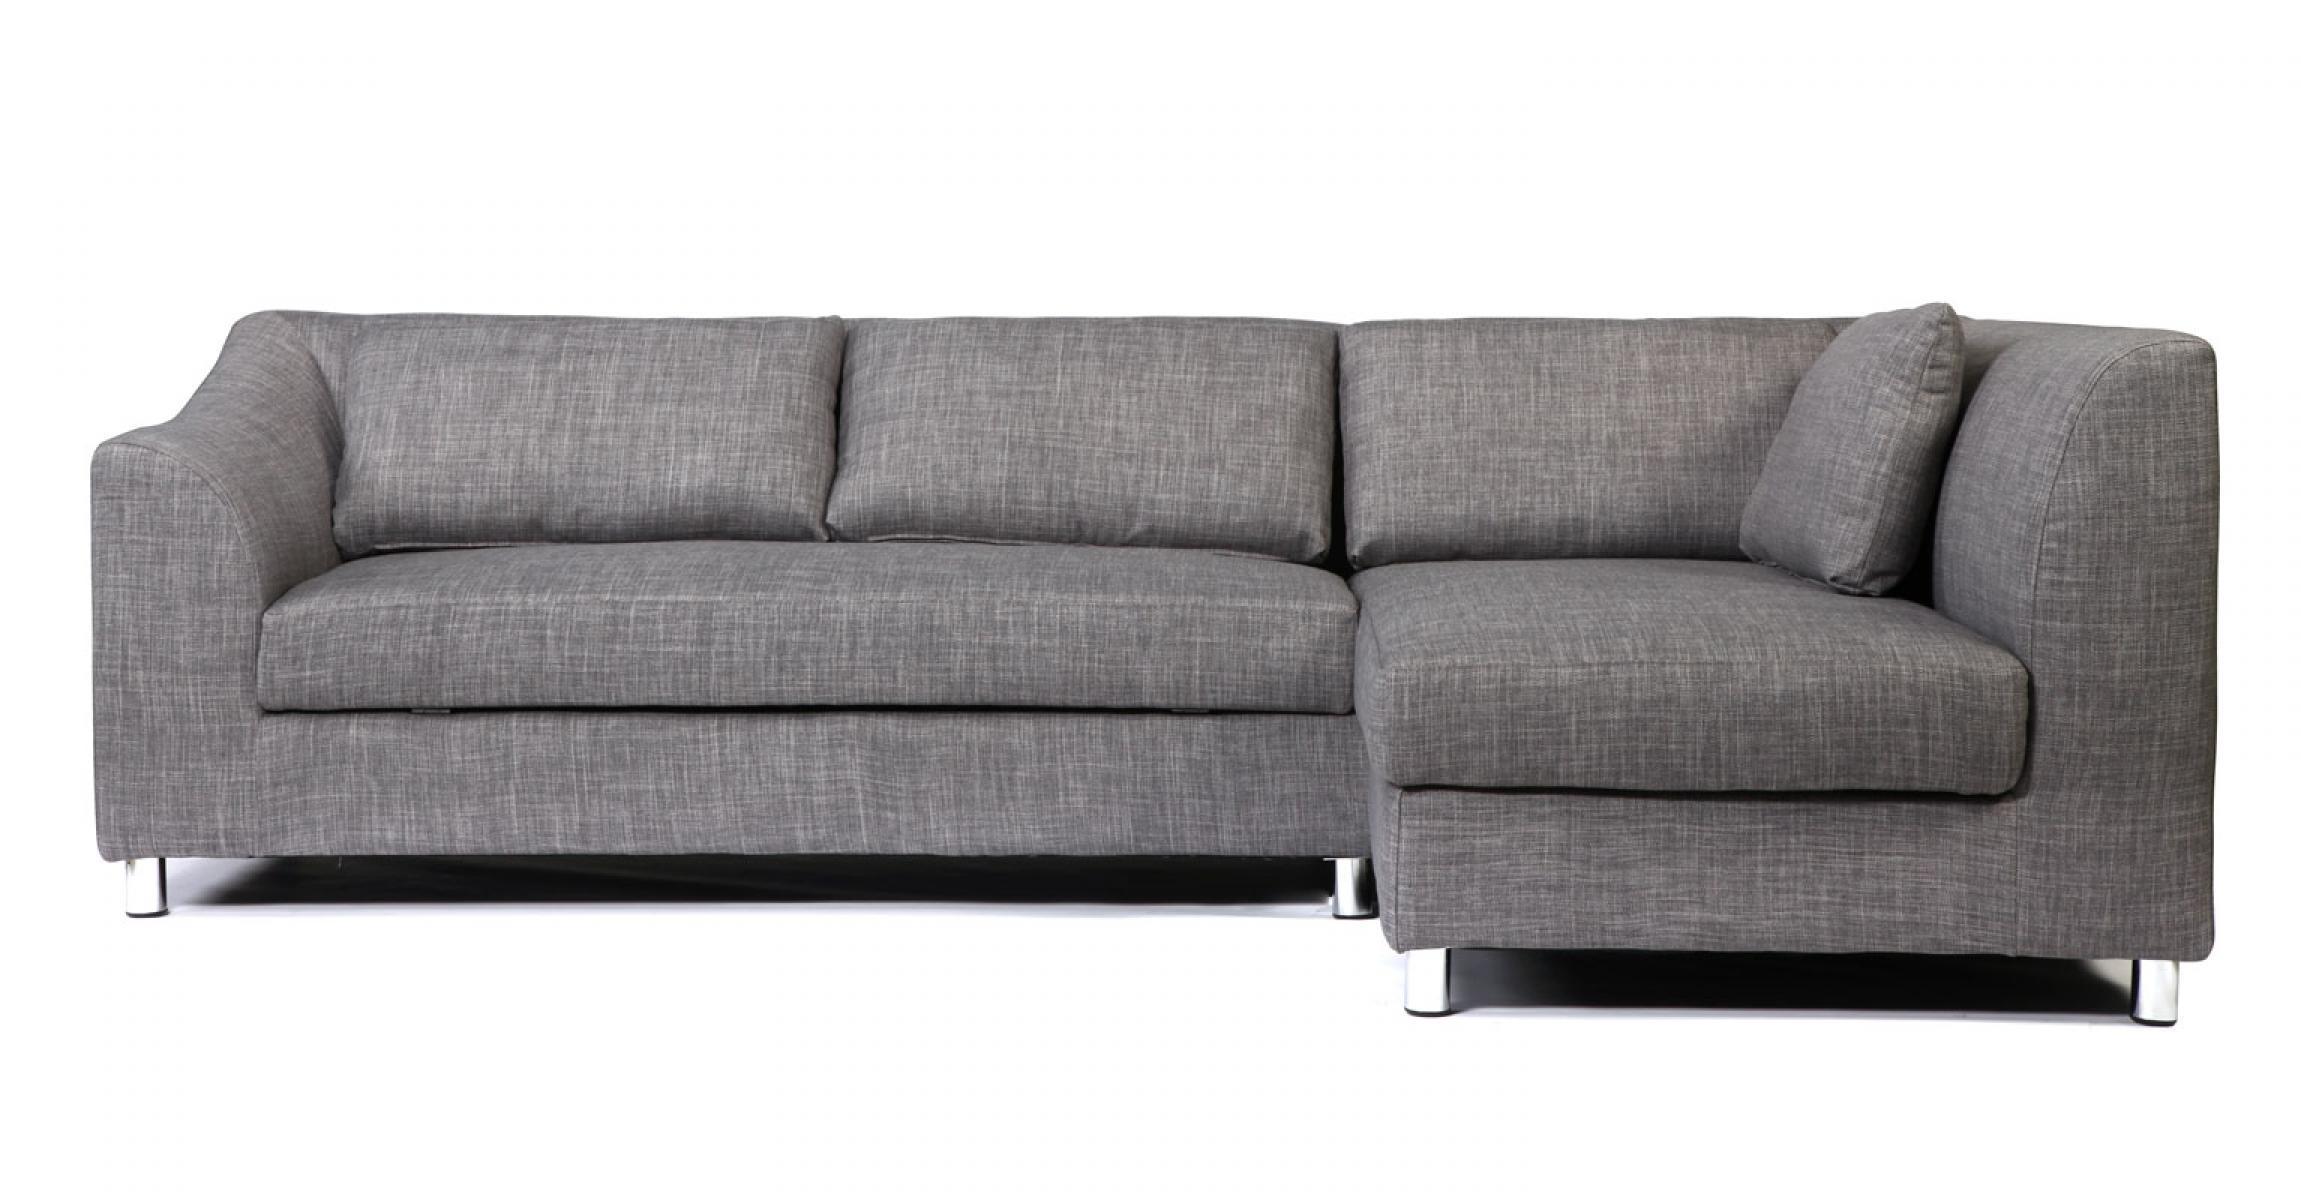 s canapé gris clair convertible